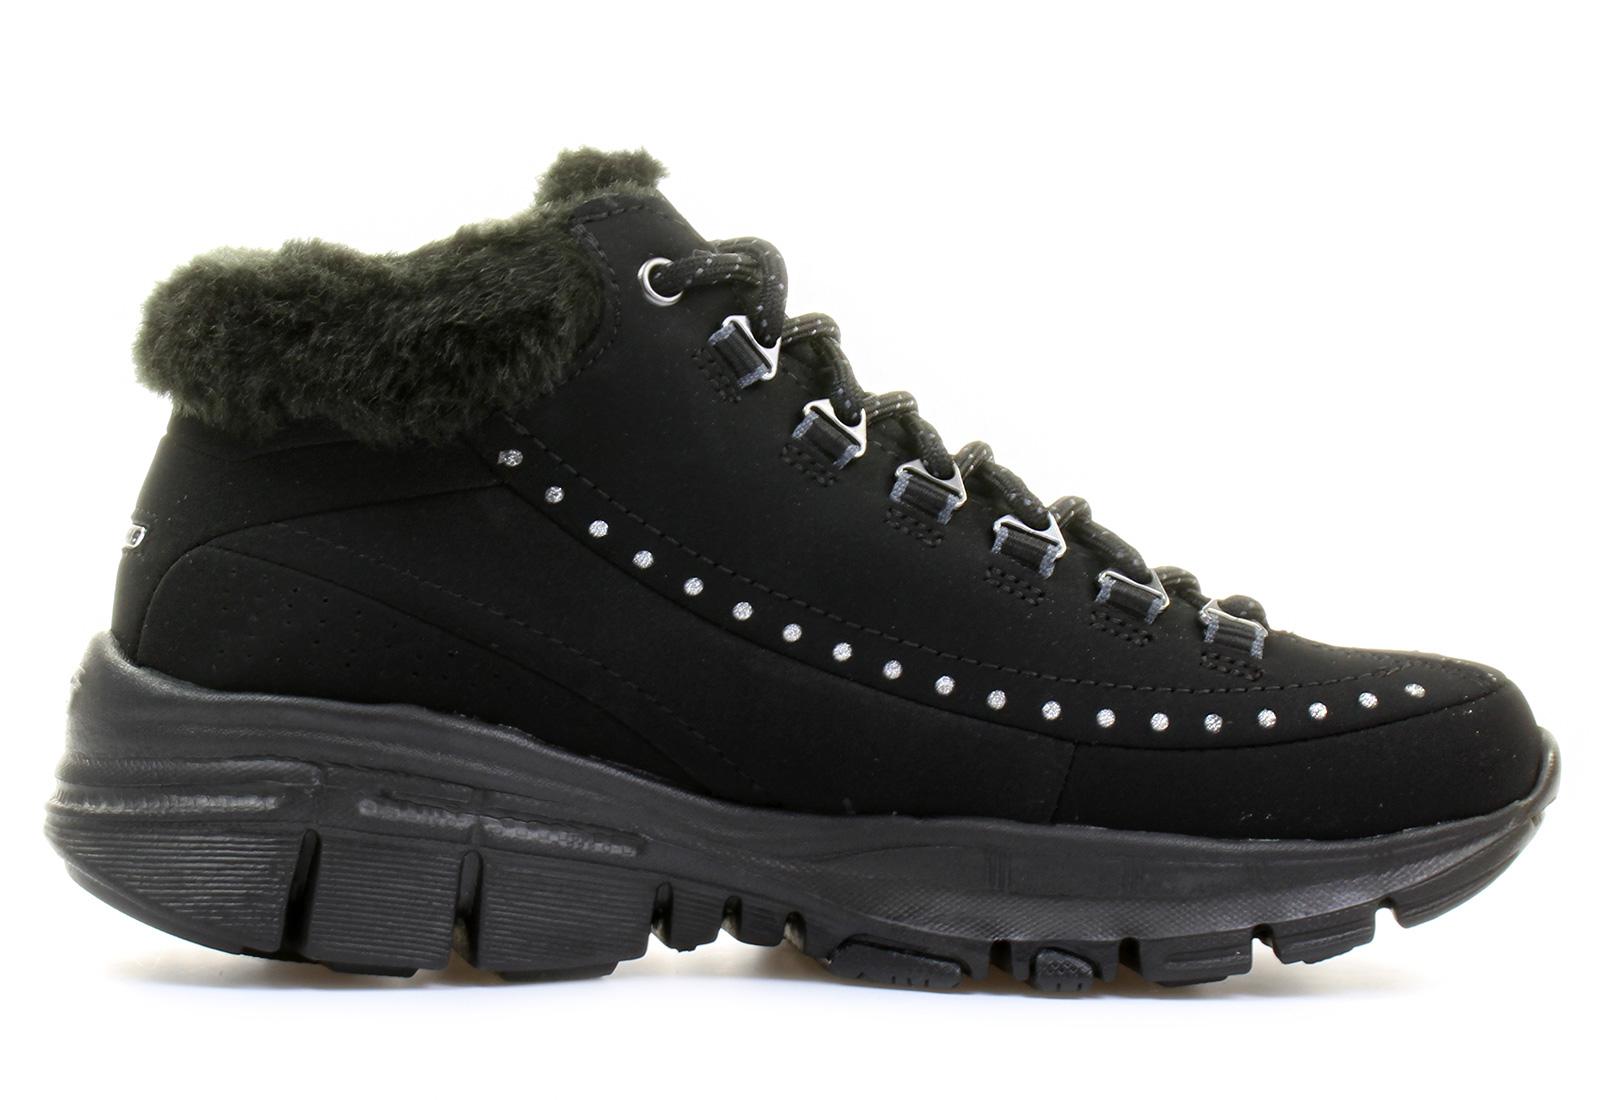 Skechers Boots Snow Mood 99999652 Blk Online Shop